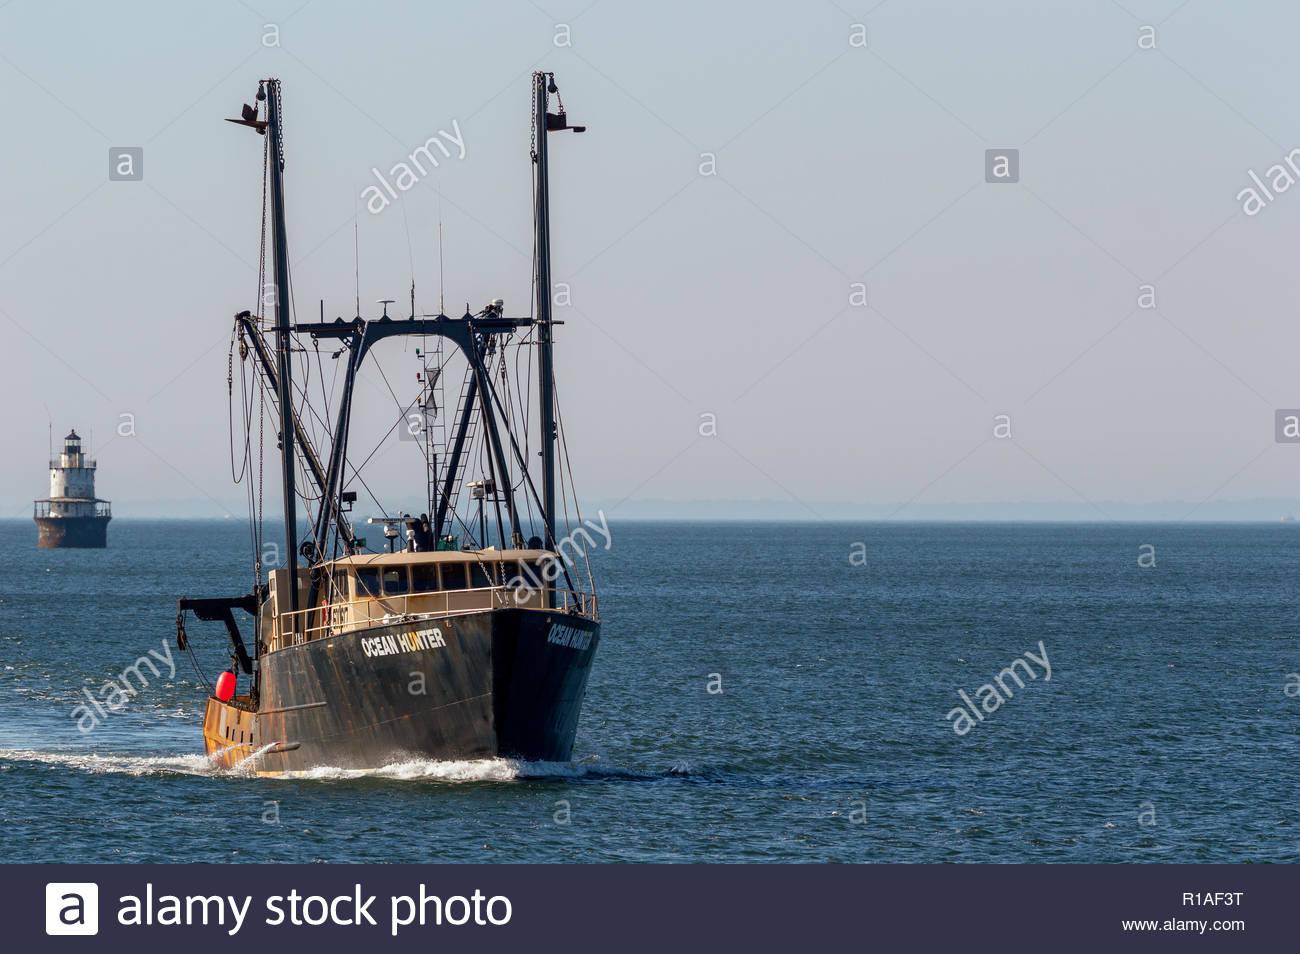 New Bedford, MA, USA - June 14, 2018: Scalloper Ocean Hunter, hailing port Newport News, VA, approaching New Bedford - Stock Image